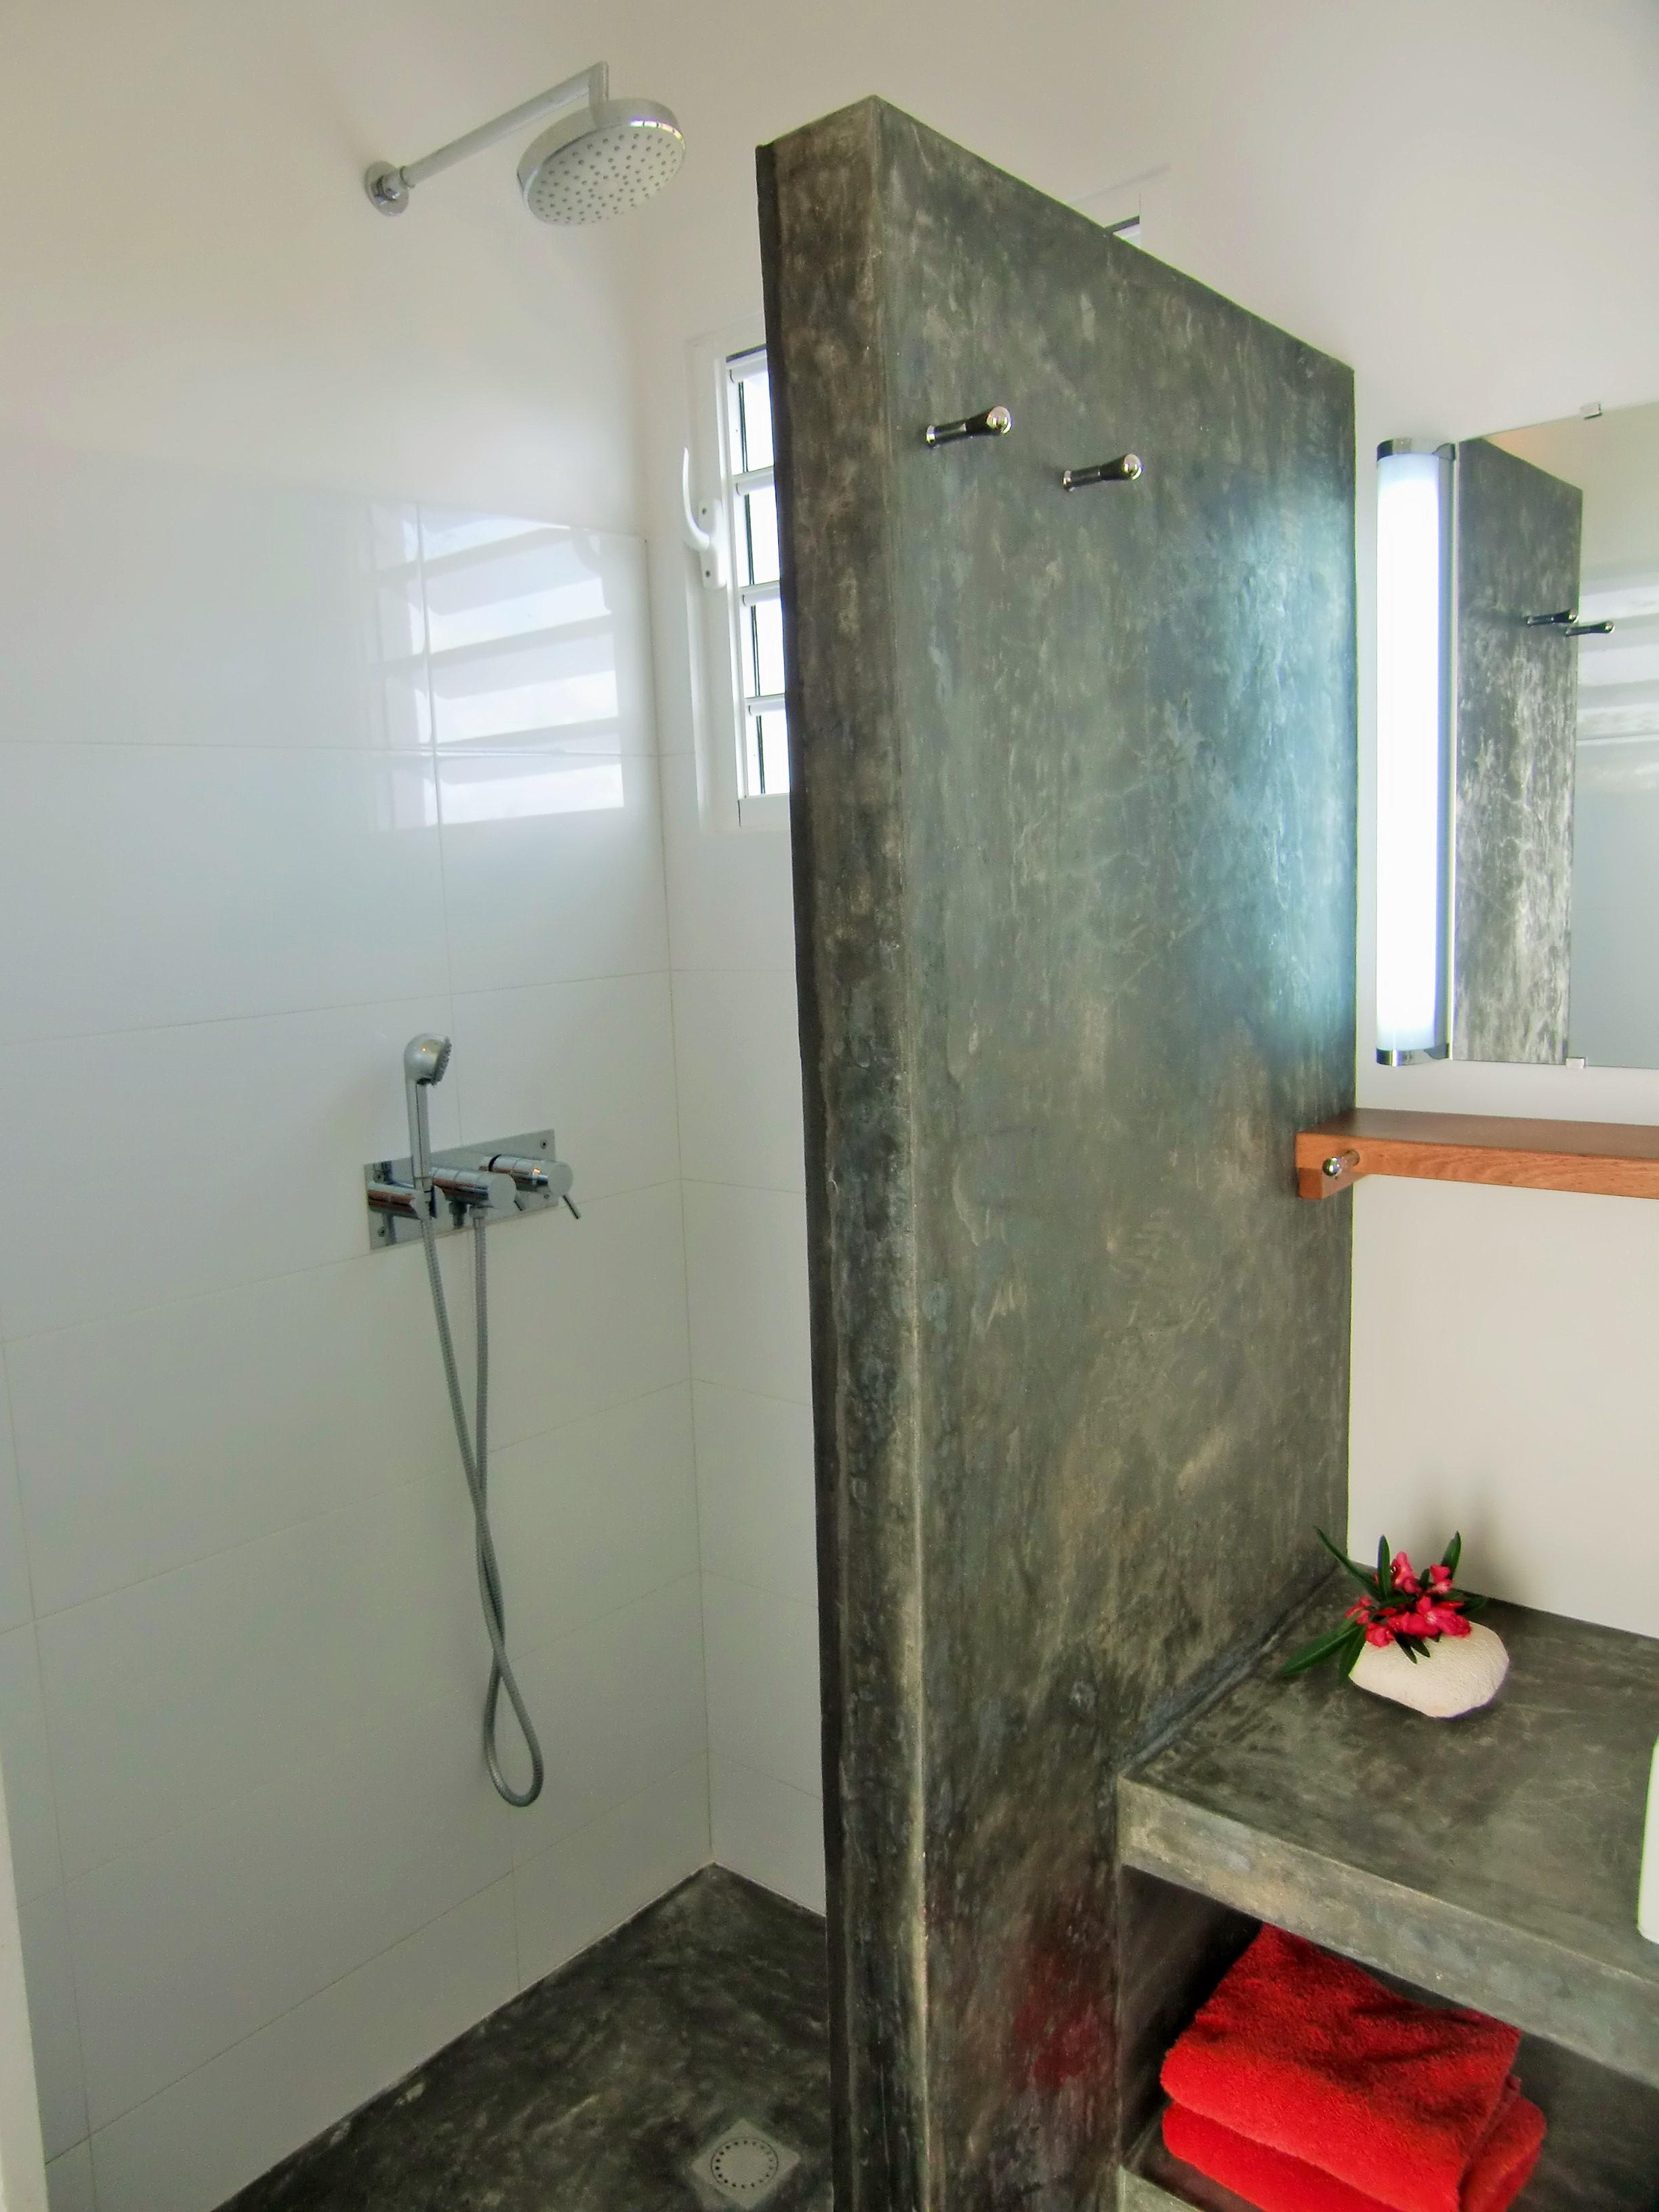 Every bedroom has a modern design ensuite full bathroom